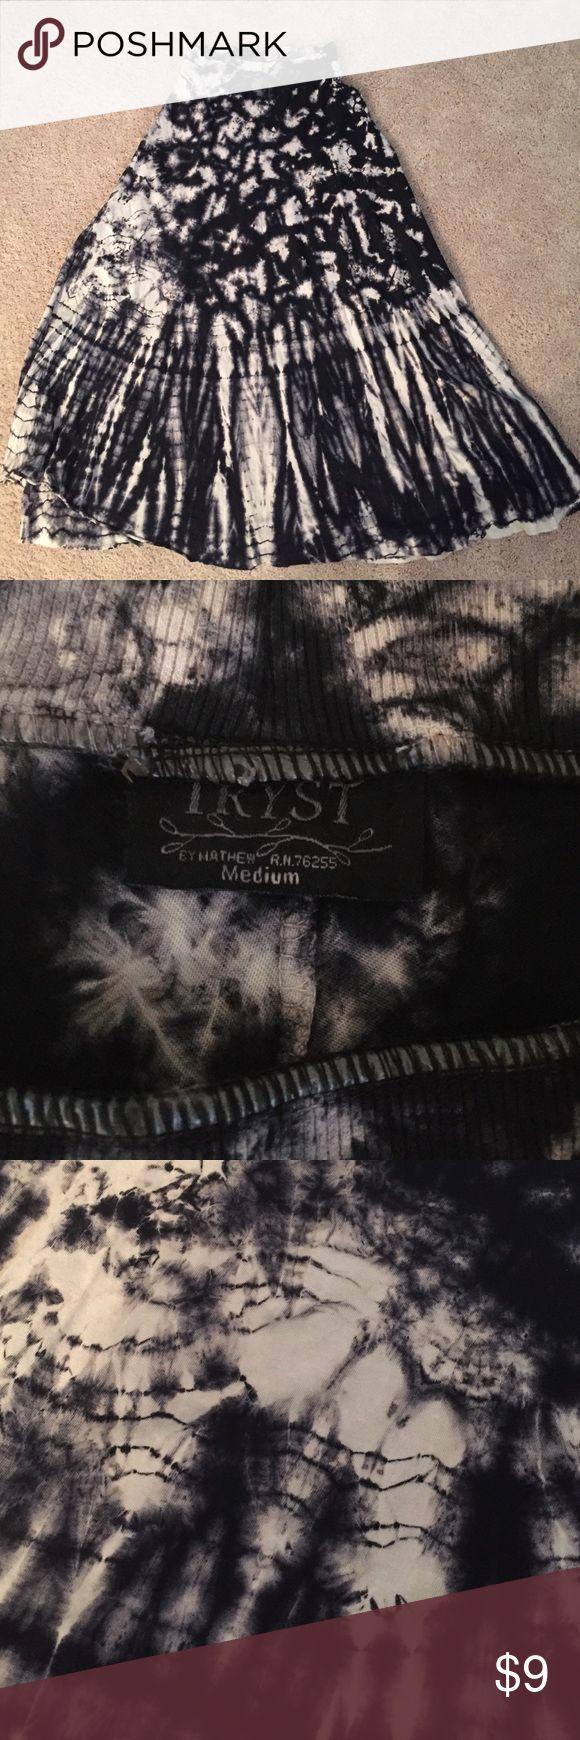 Navy Tye Dye Maxi Skirt Soft cotton Maxi skirt. Comfy! Purchased at Dillard's tryst Skirts Maxi